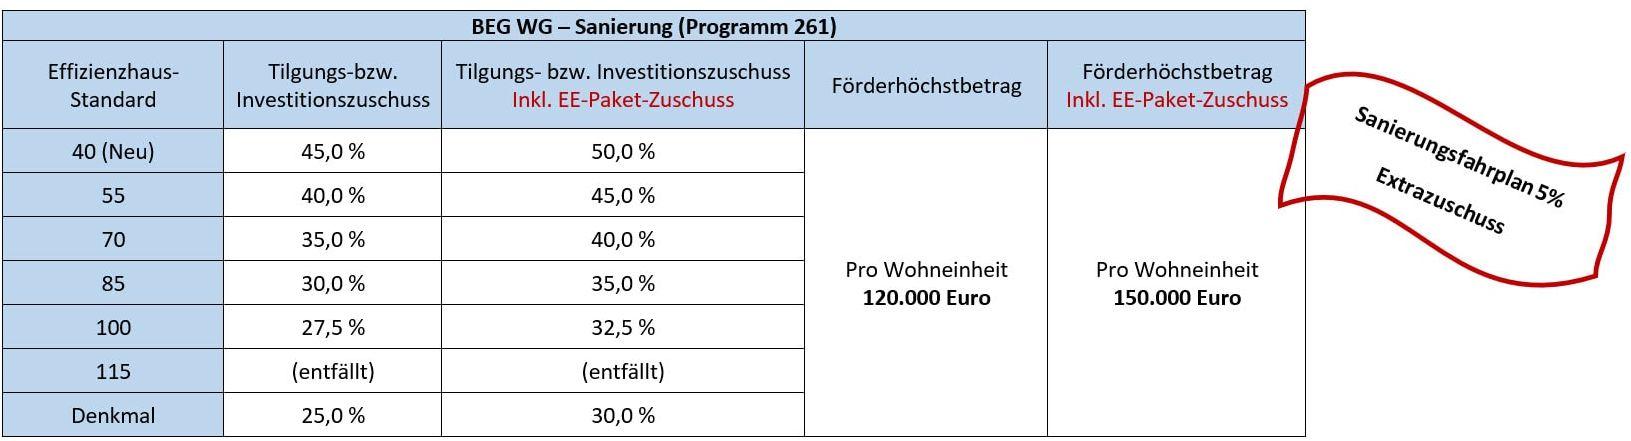 Programm 261 - Sanierung-- BEG WG – Neubau (Programm 261), Kaufering, Buchloe, Landsberg am Lech, Augsburg, Penzing, Igling